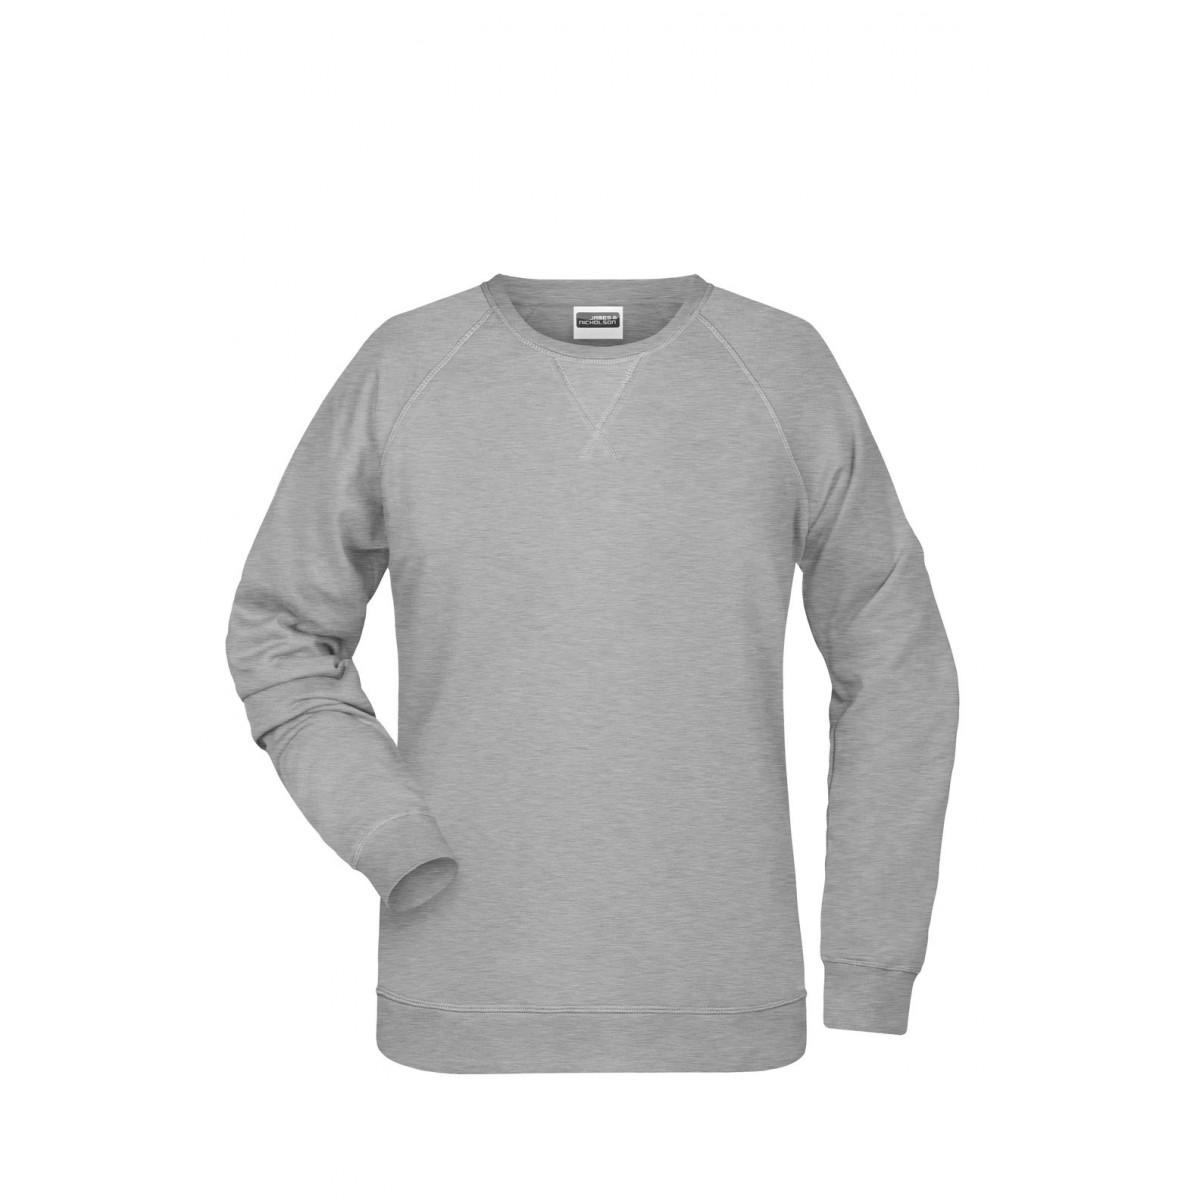 Толстовка женская 8021 Ladies Sweat - Серый меланж